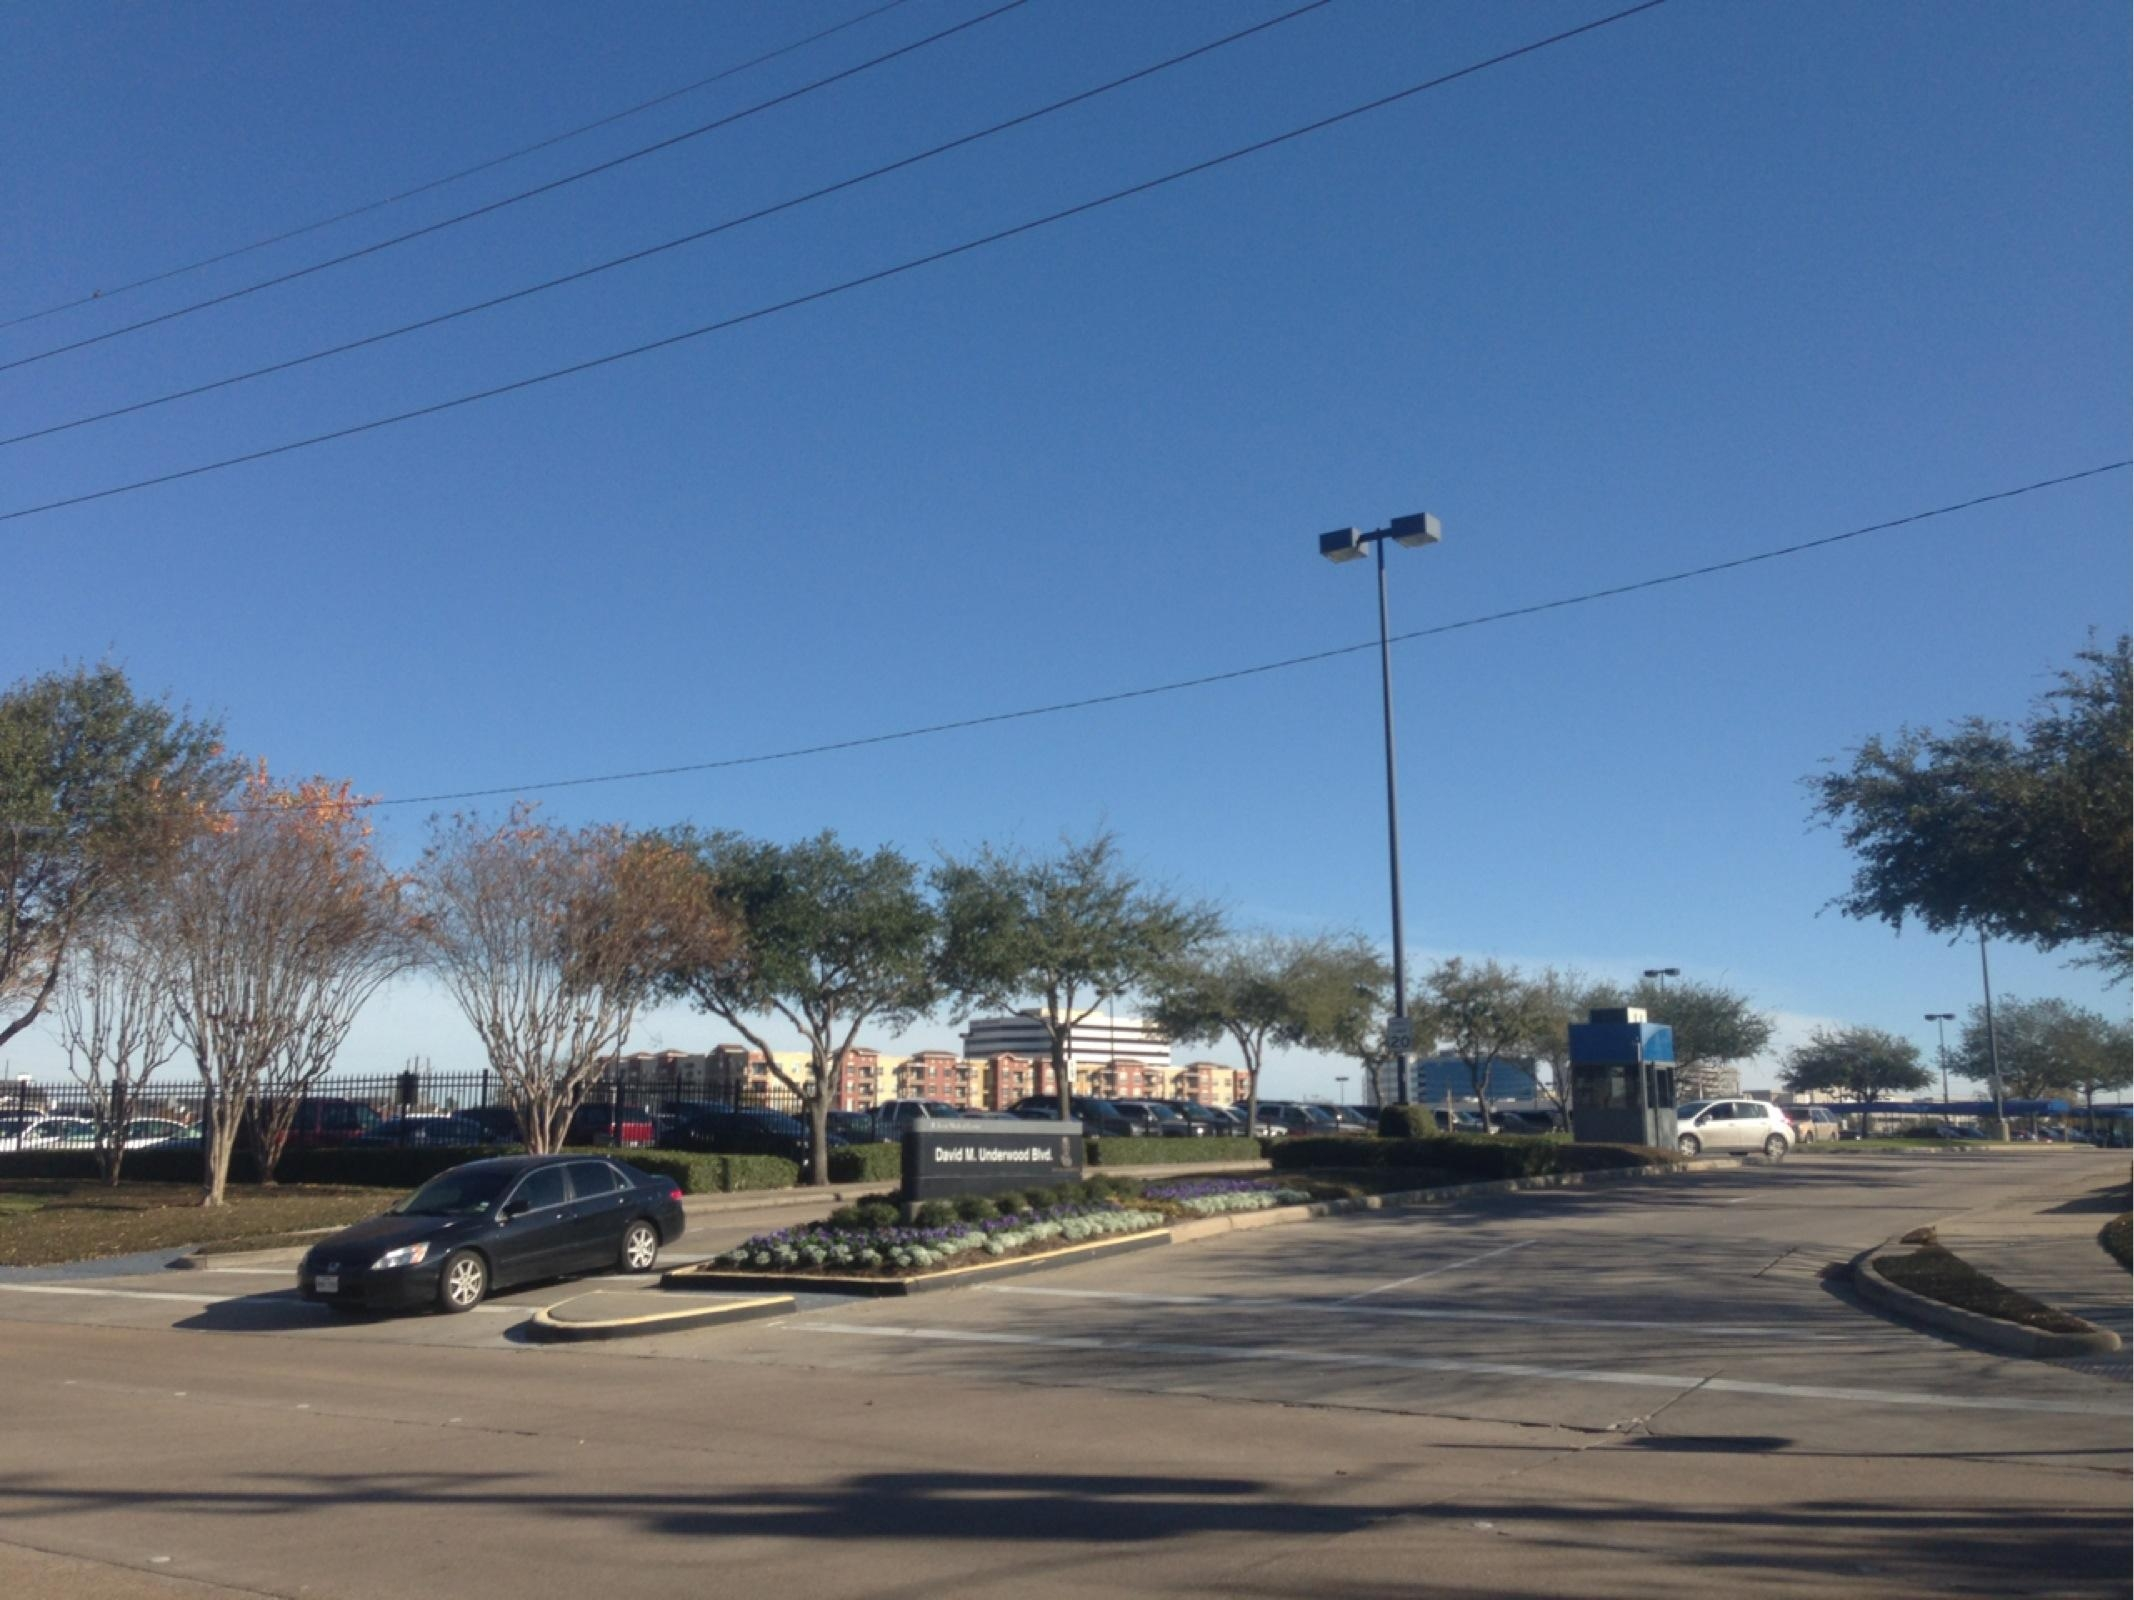 6550 Bertner Ave Parking - Parking in Houston | ParkMe